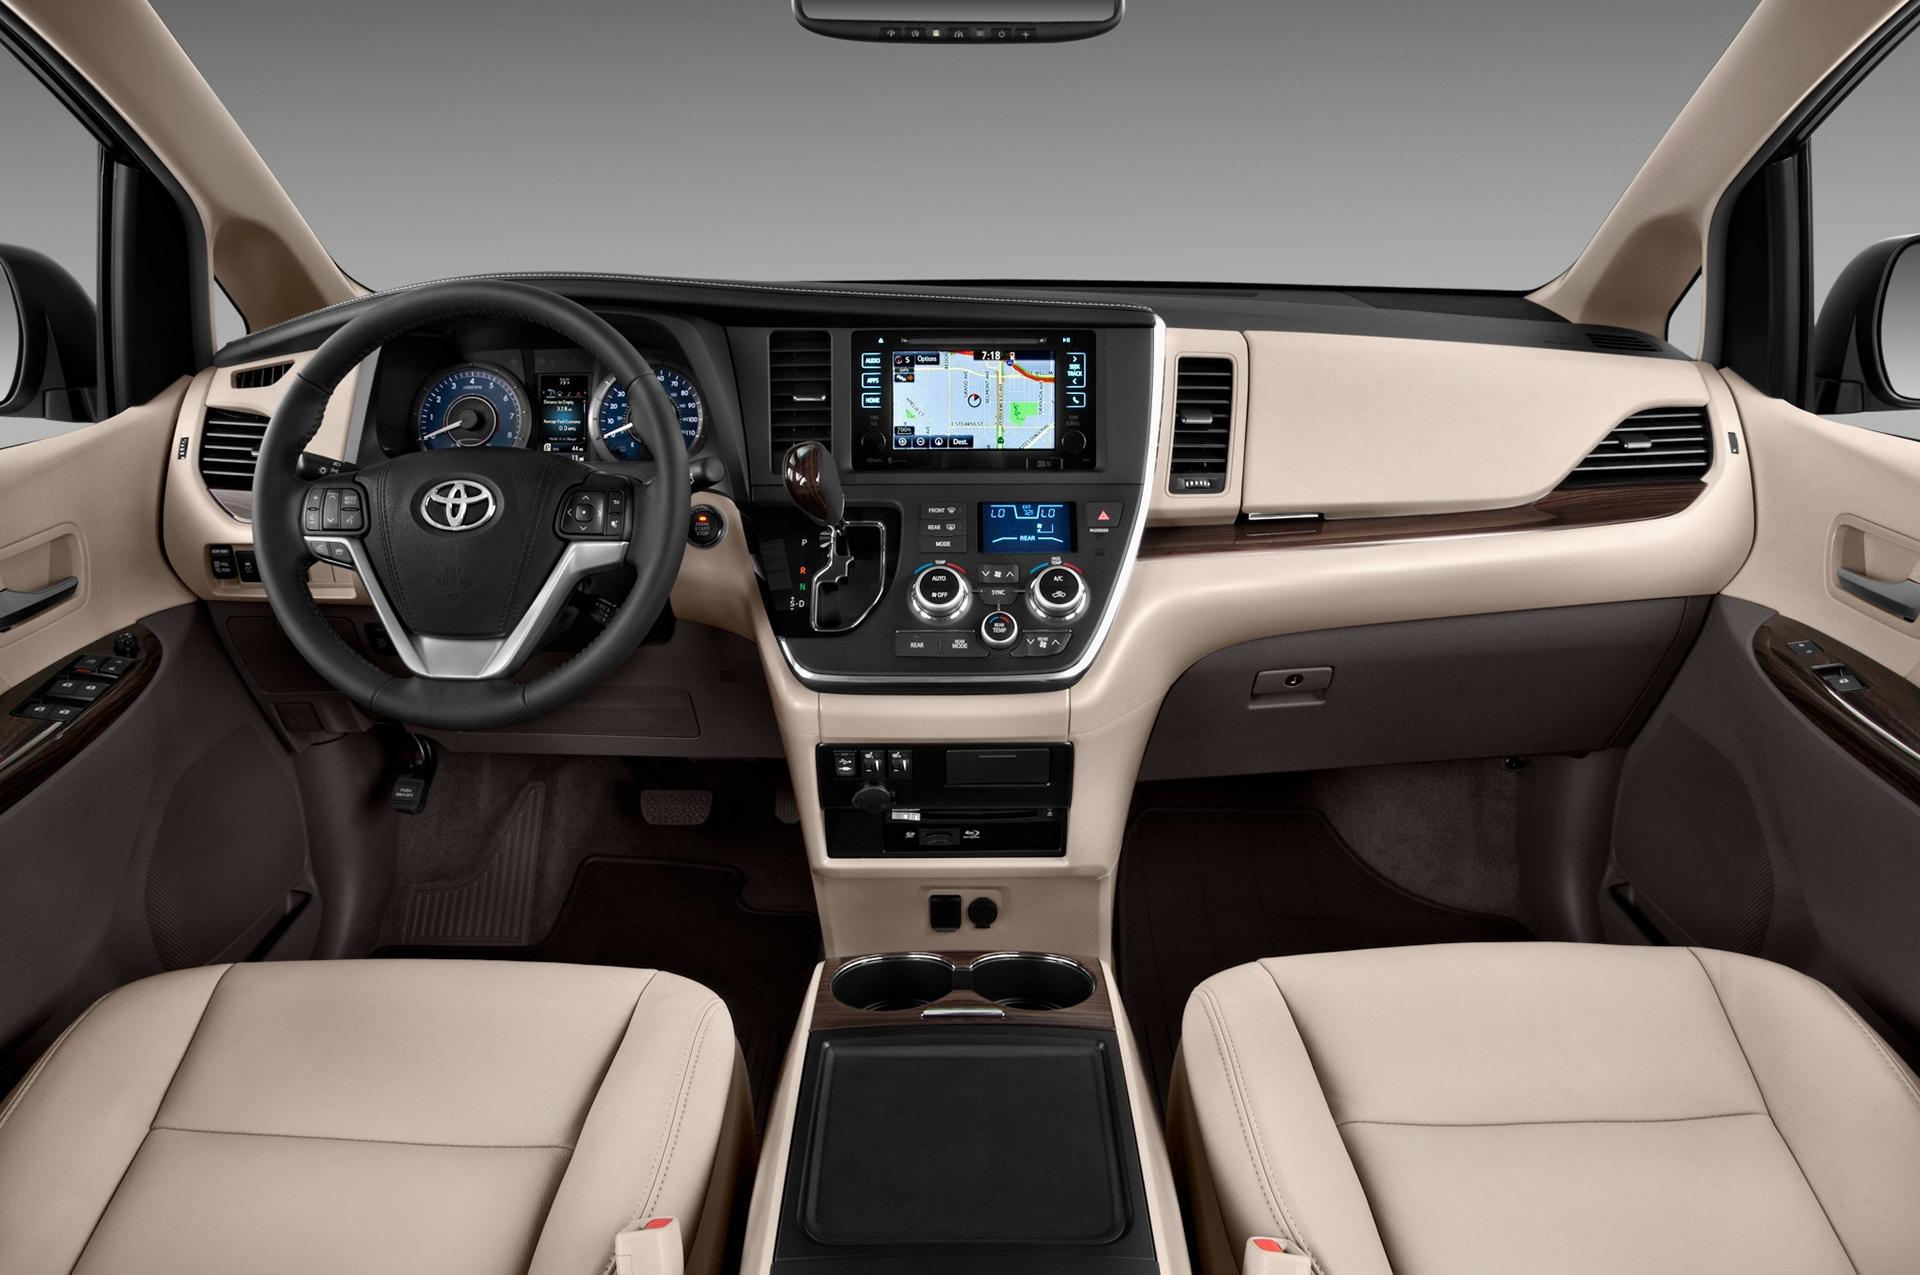 2017 Toyota Sienna XLE © Toyota Motor Corporation